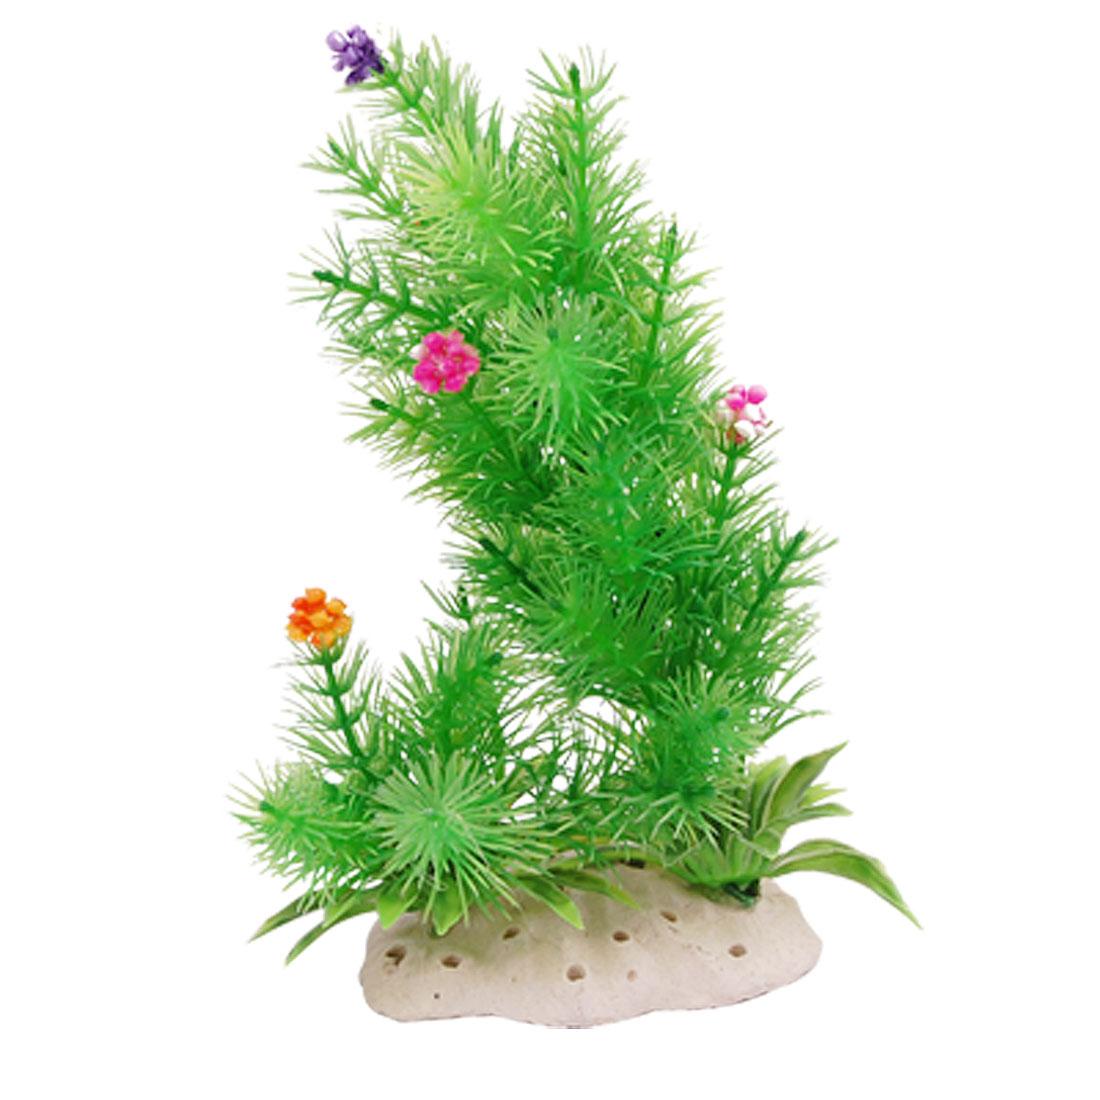 Green Underwater Plastic Plants Aquarium Tank Ornament